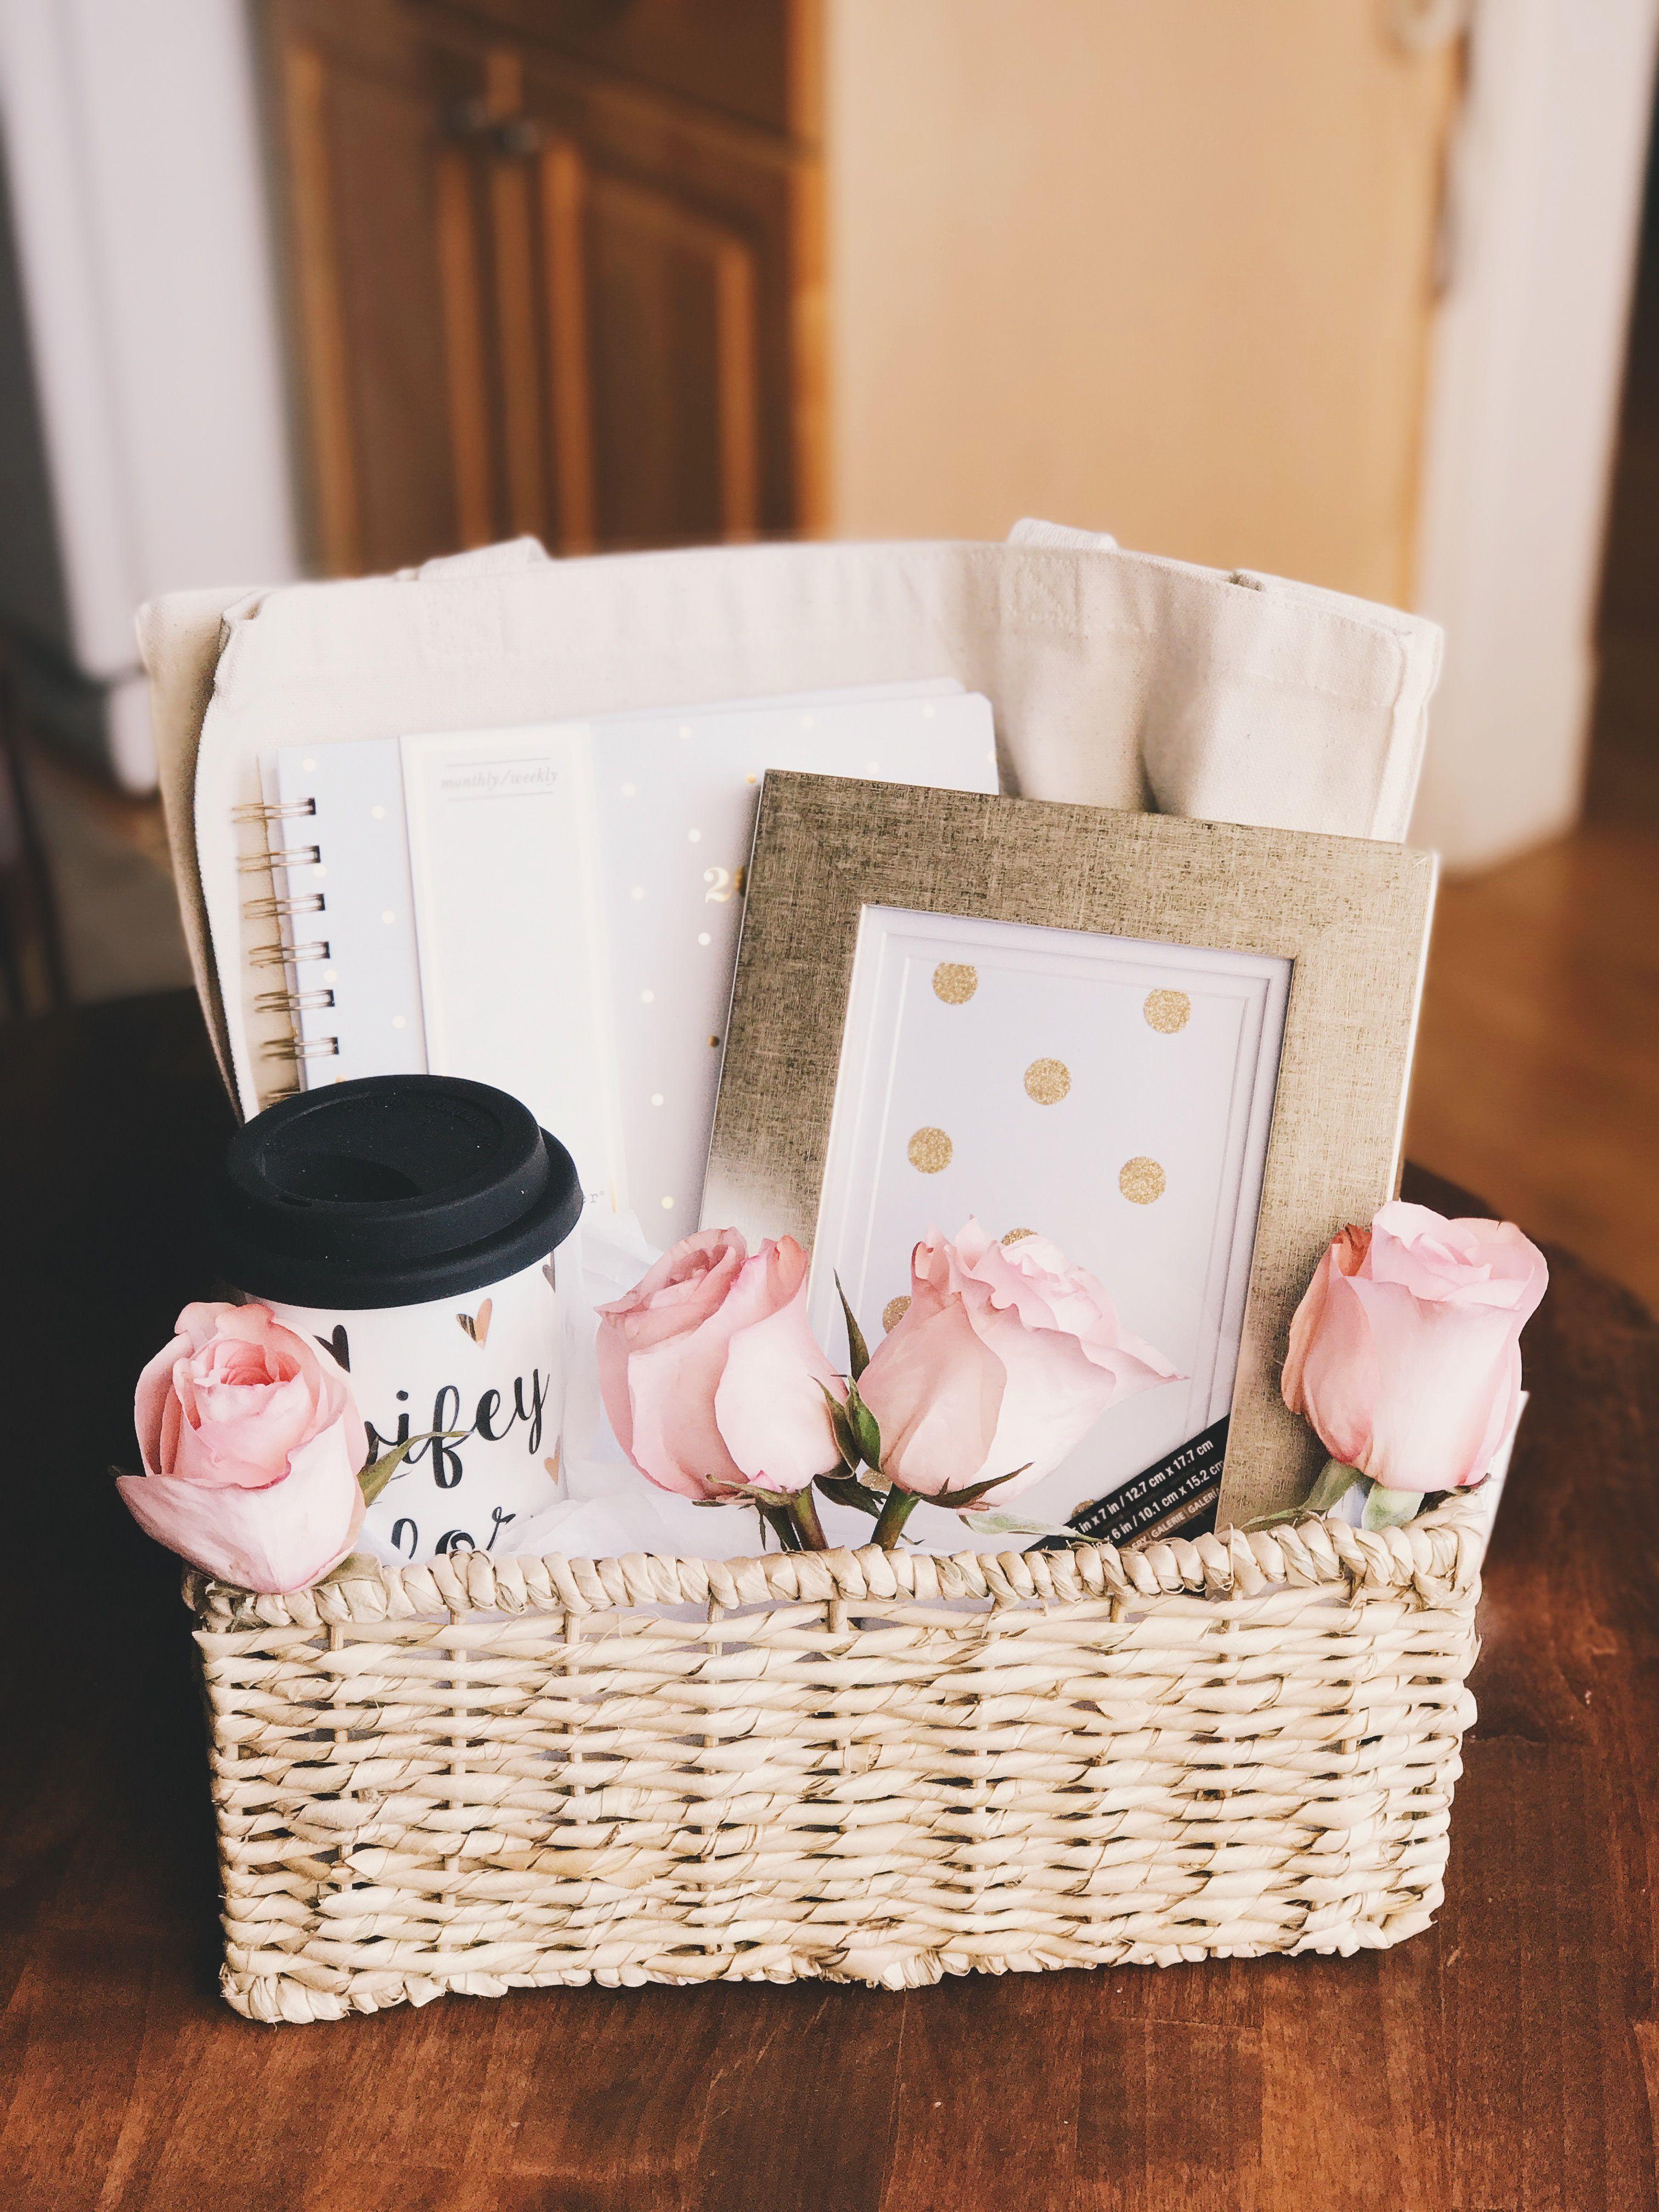 Diy Engagement Basket Made By Me Gift Baskets Pinterest